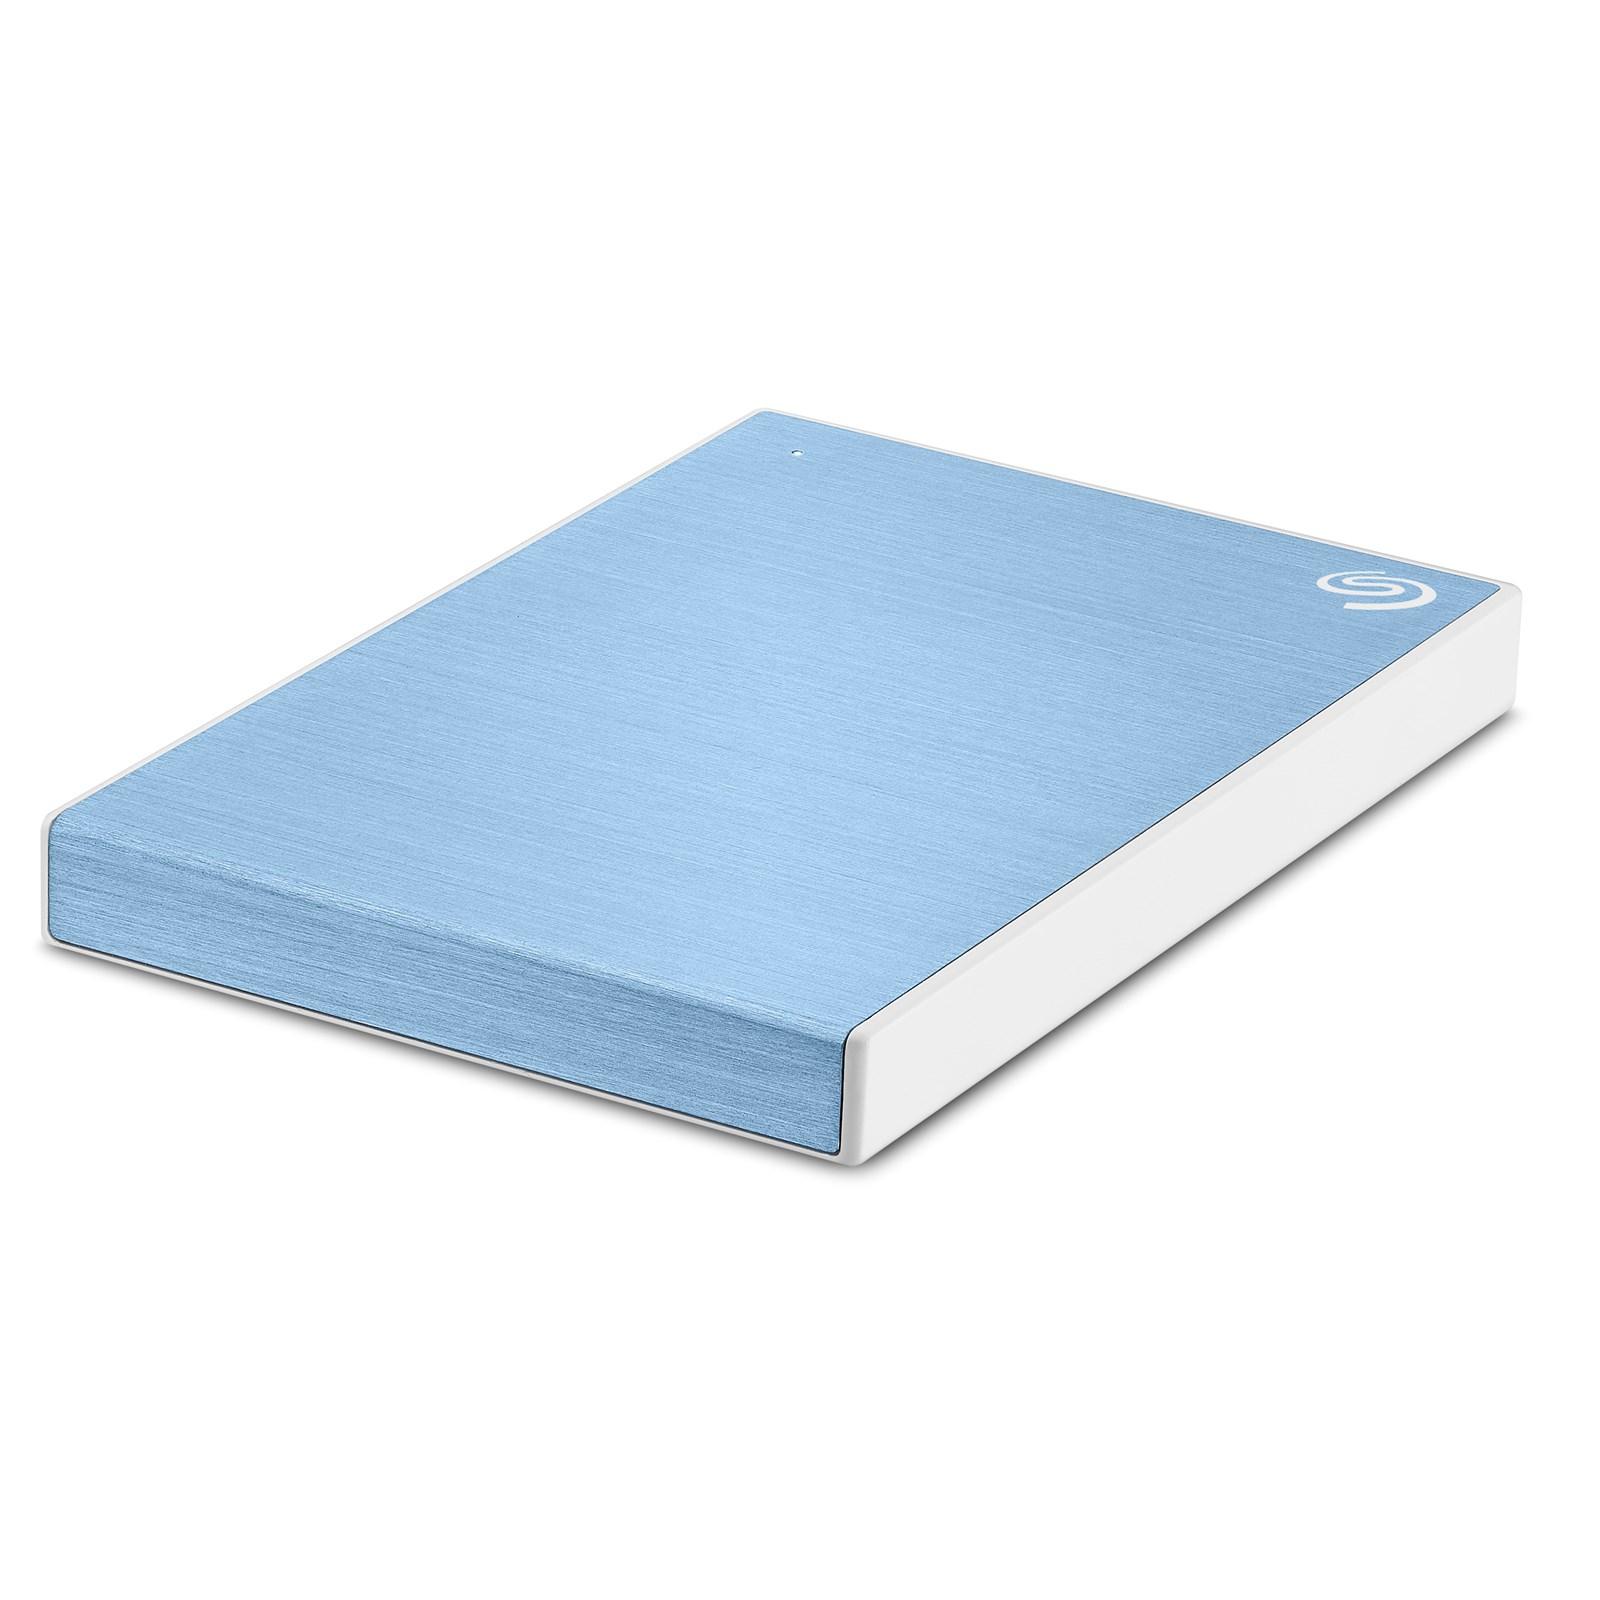 Внешний жесткий диск Seagate Backup Plus STHP5000402 5Tb USB 3.0/2.5